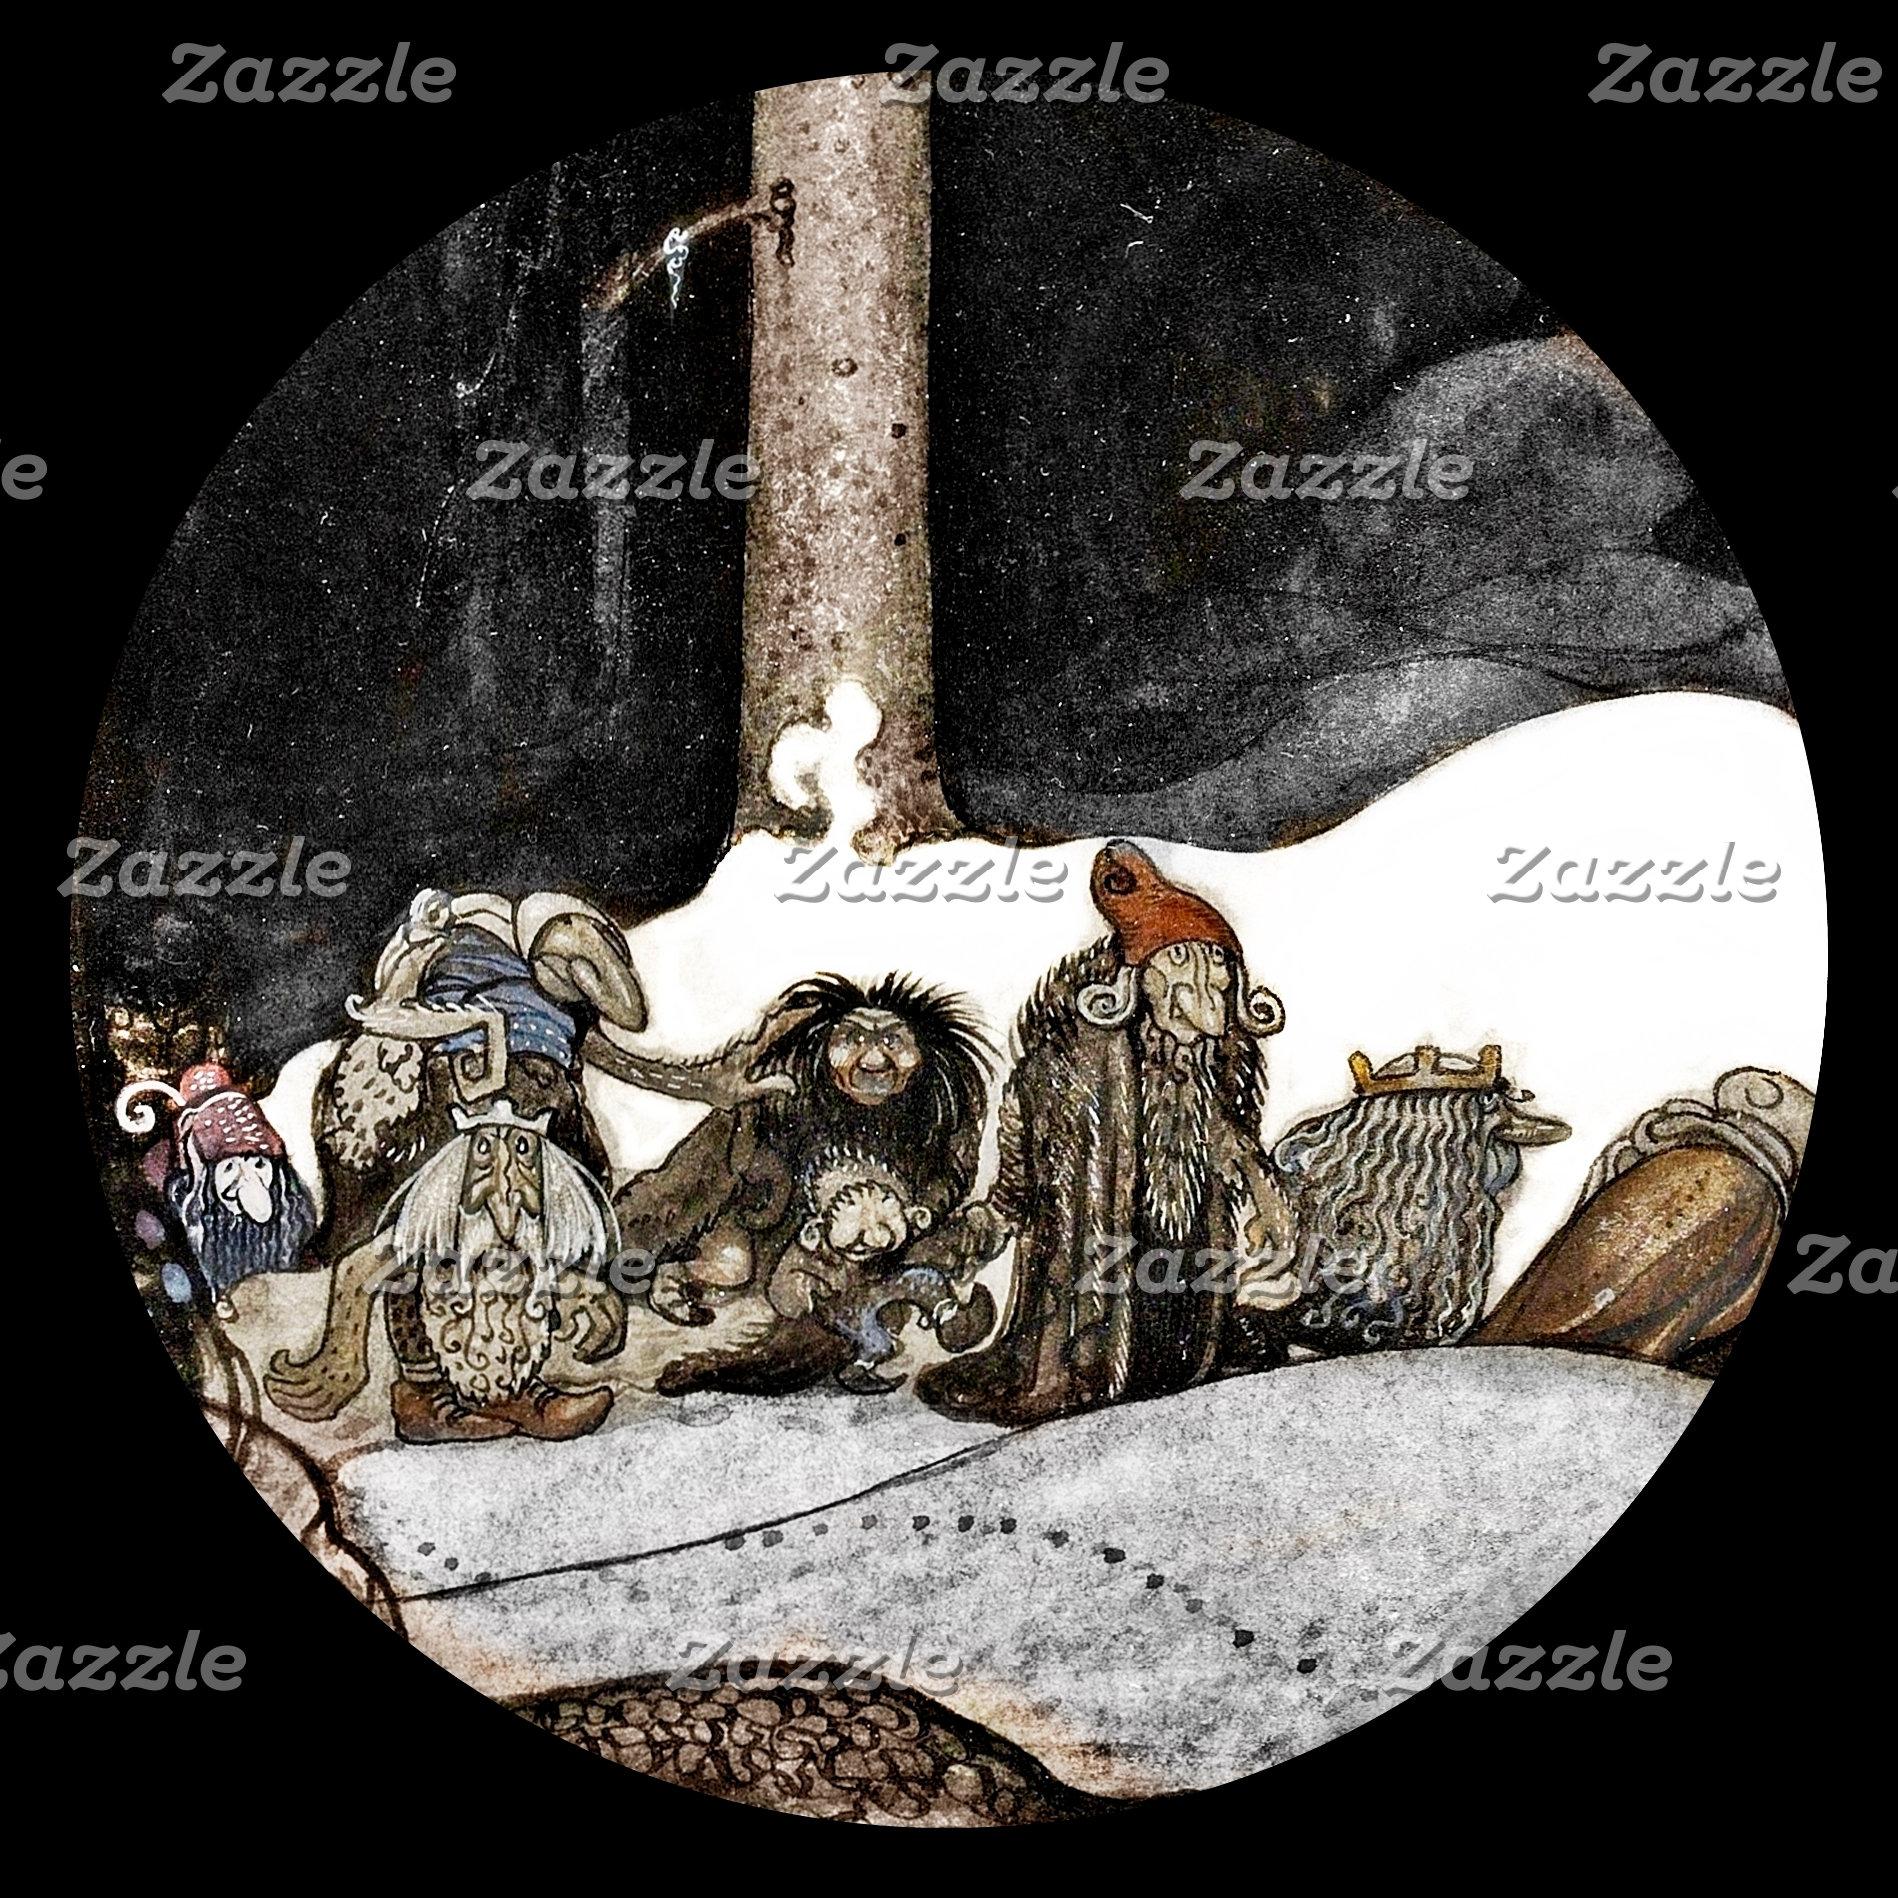 John Bauer Fairytale Art